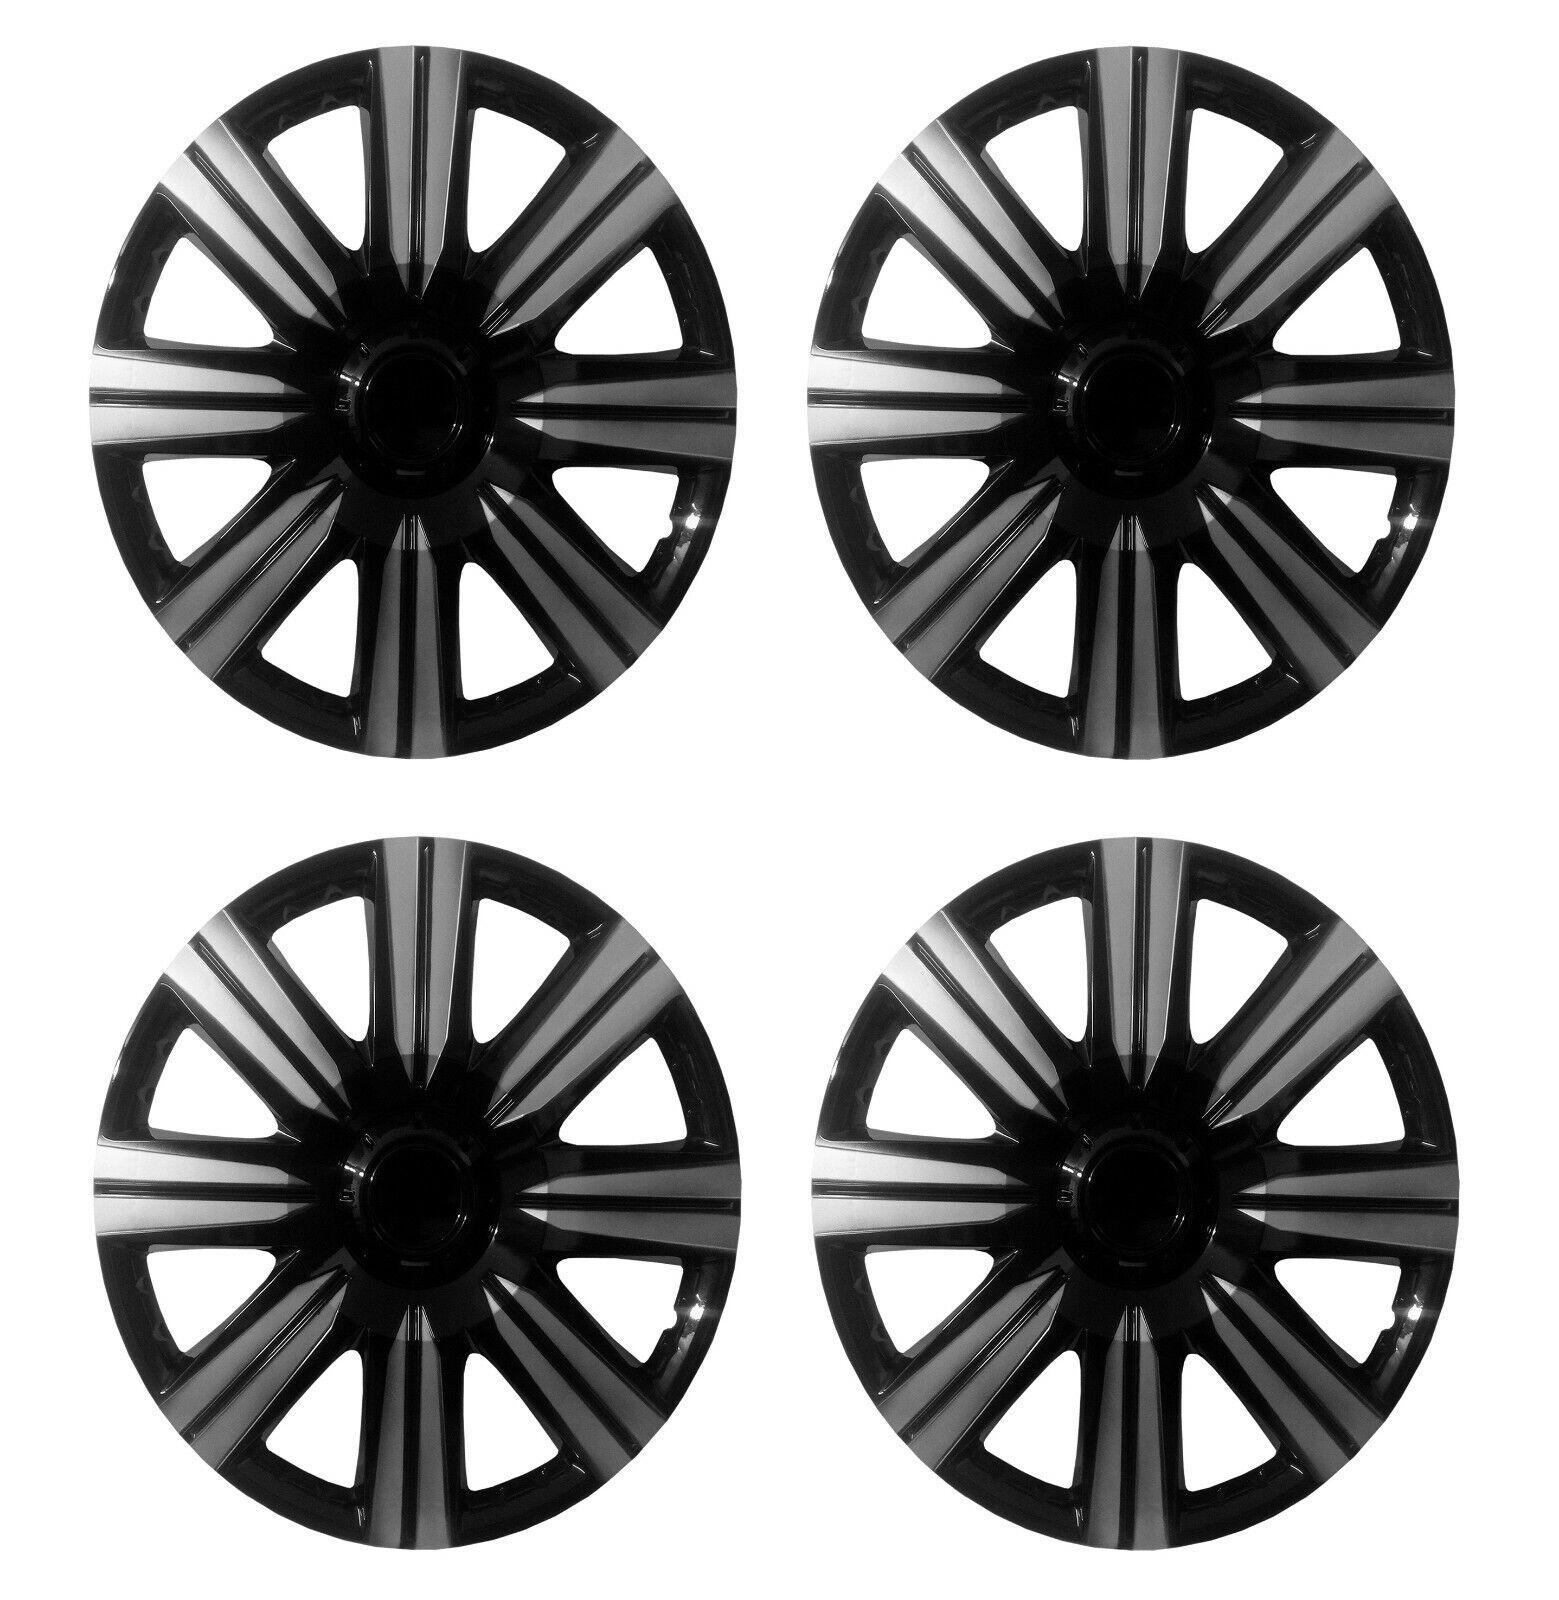 WHEEL TRIMS SET OF 4 x 14 INCH CAR COVER HUB CAPS CAP BLACK/SILVER LOOK 14